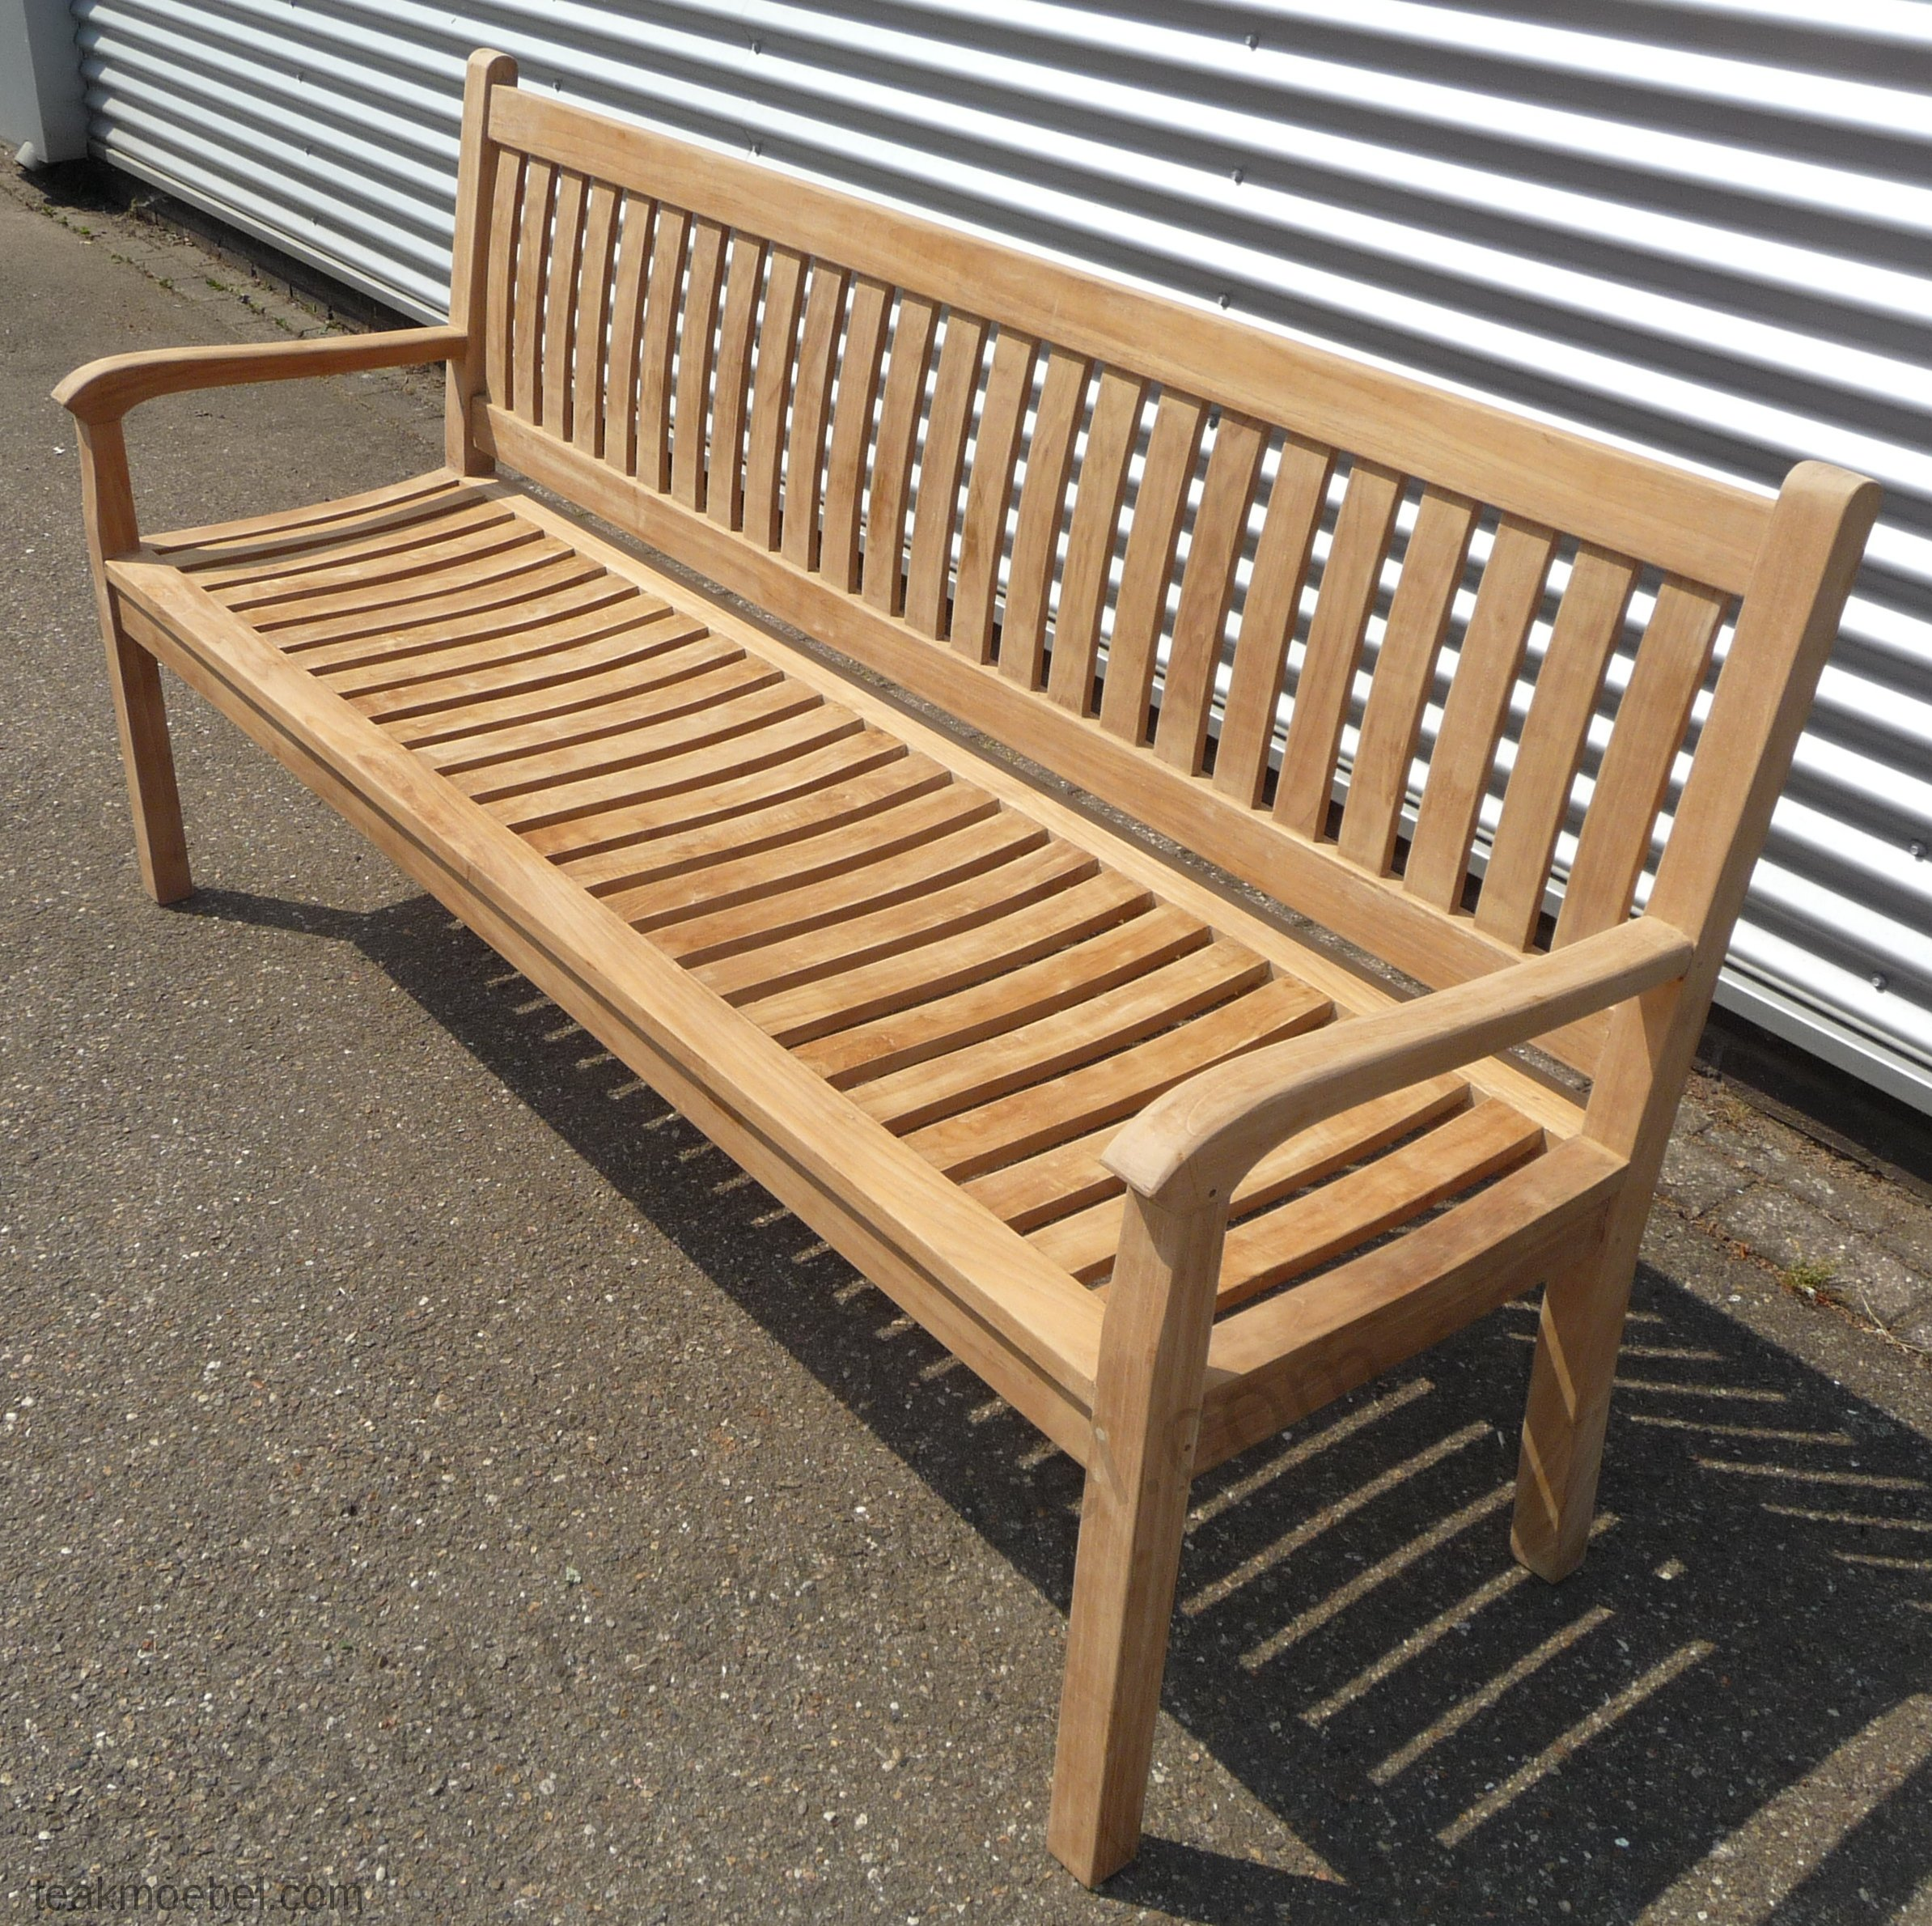 Teak Holz Gartenbank 180 Cm Beaufort Teakmobel Com